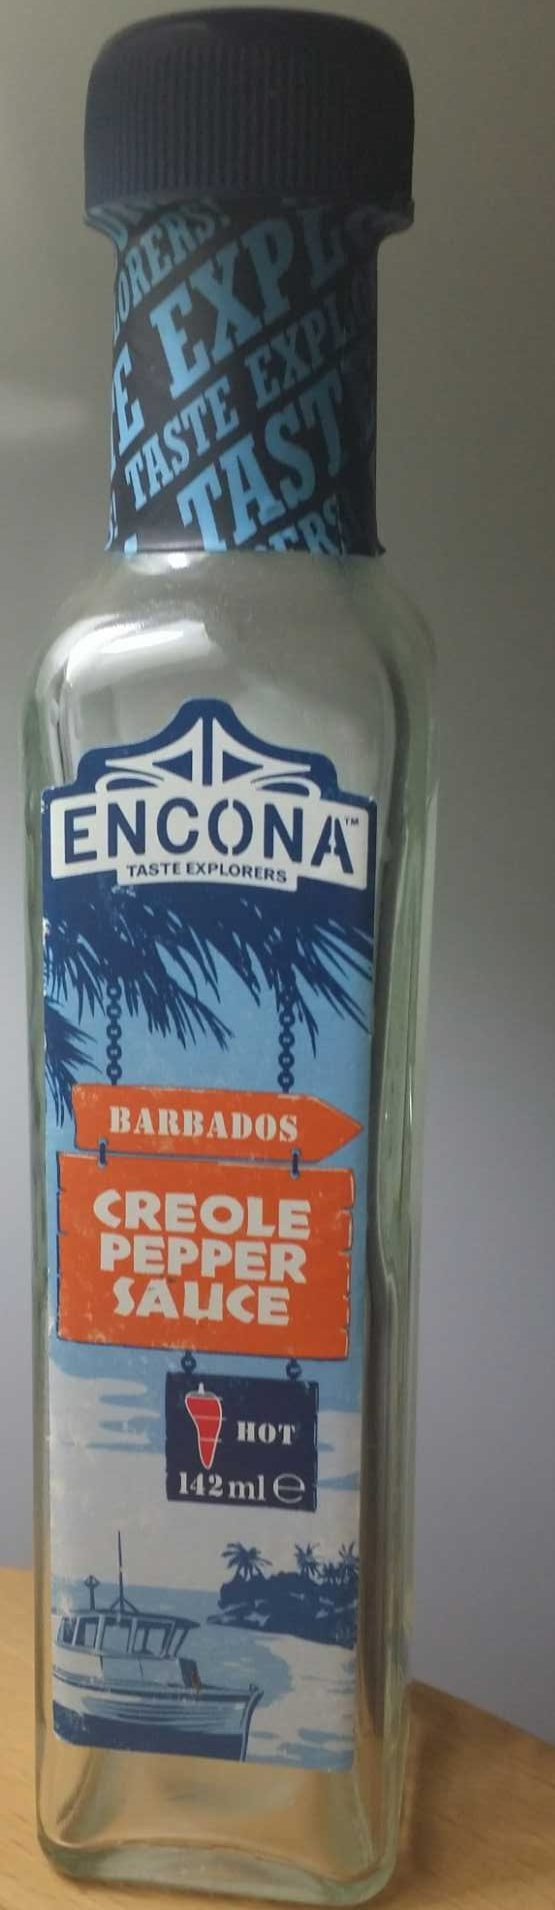 Barbados Créole Pepper Sauce - Produit